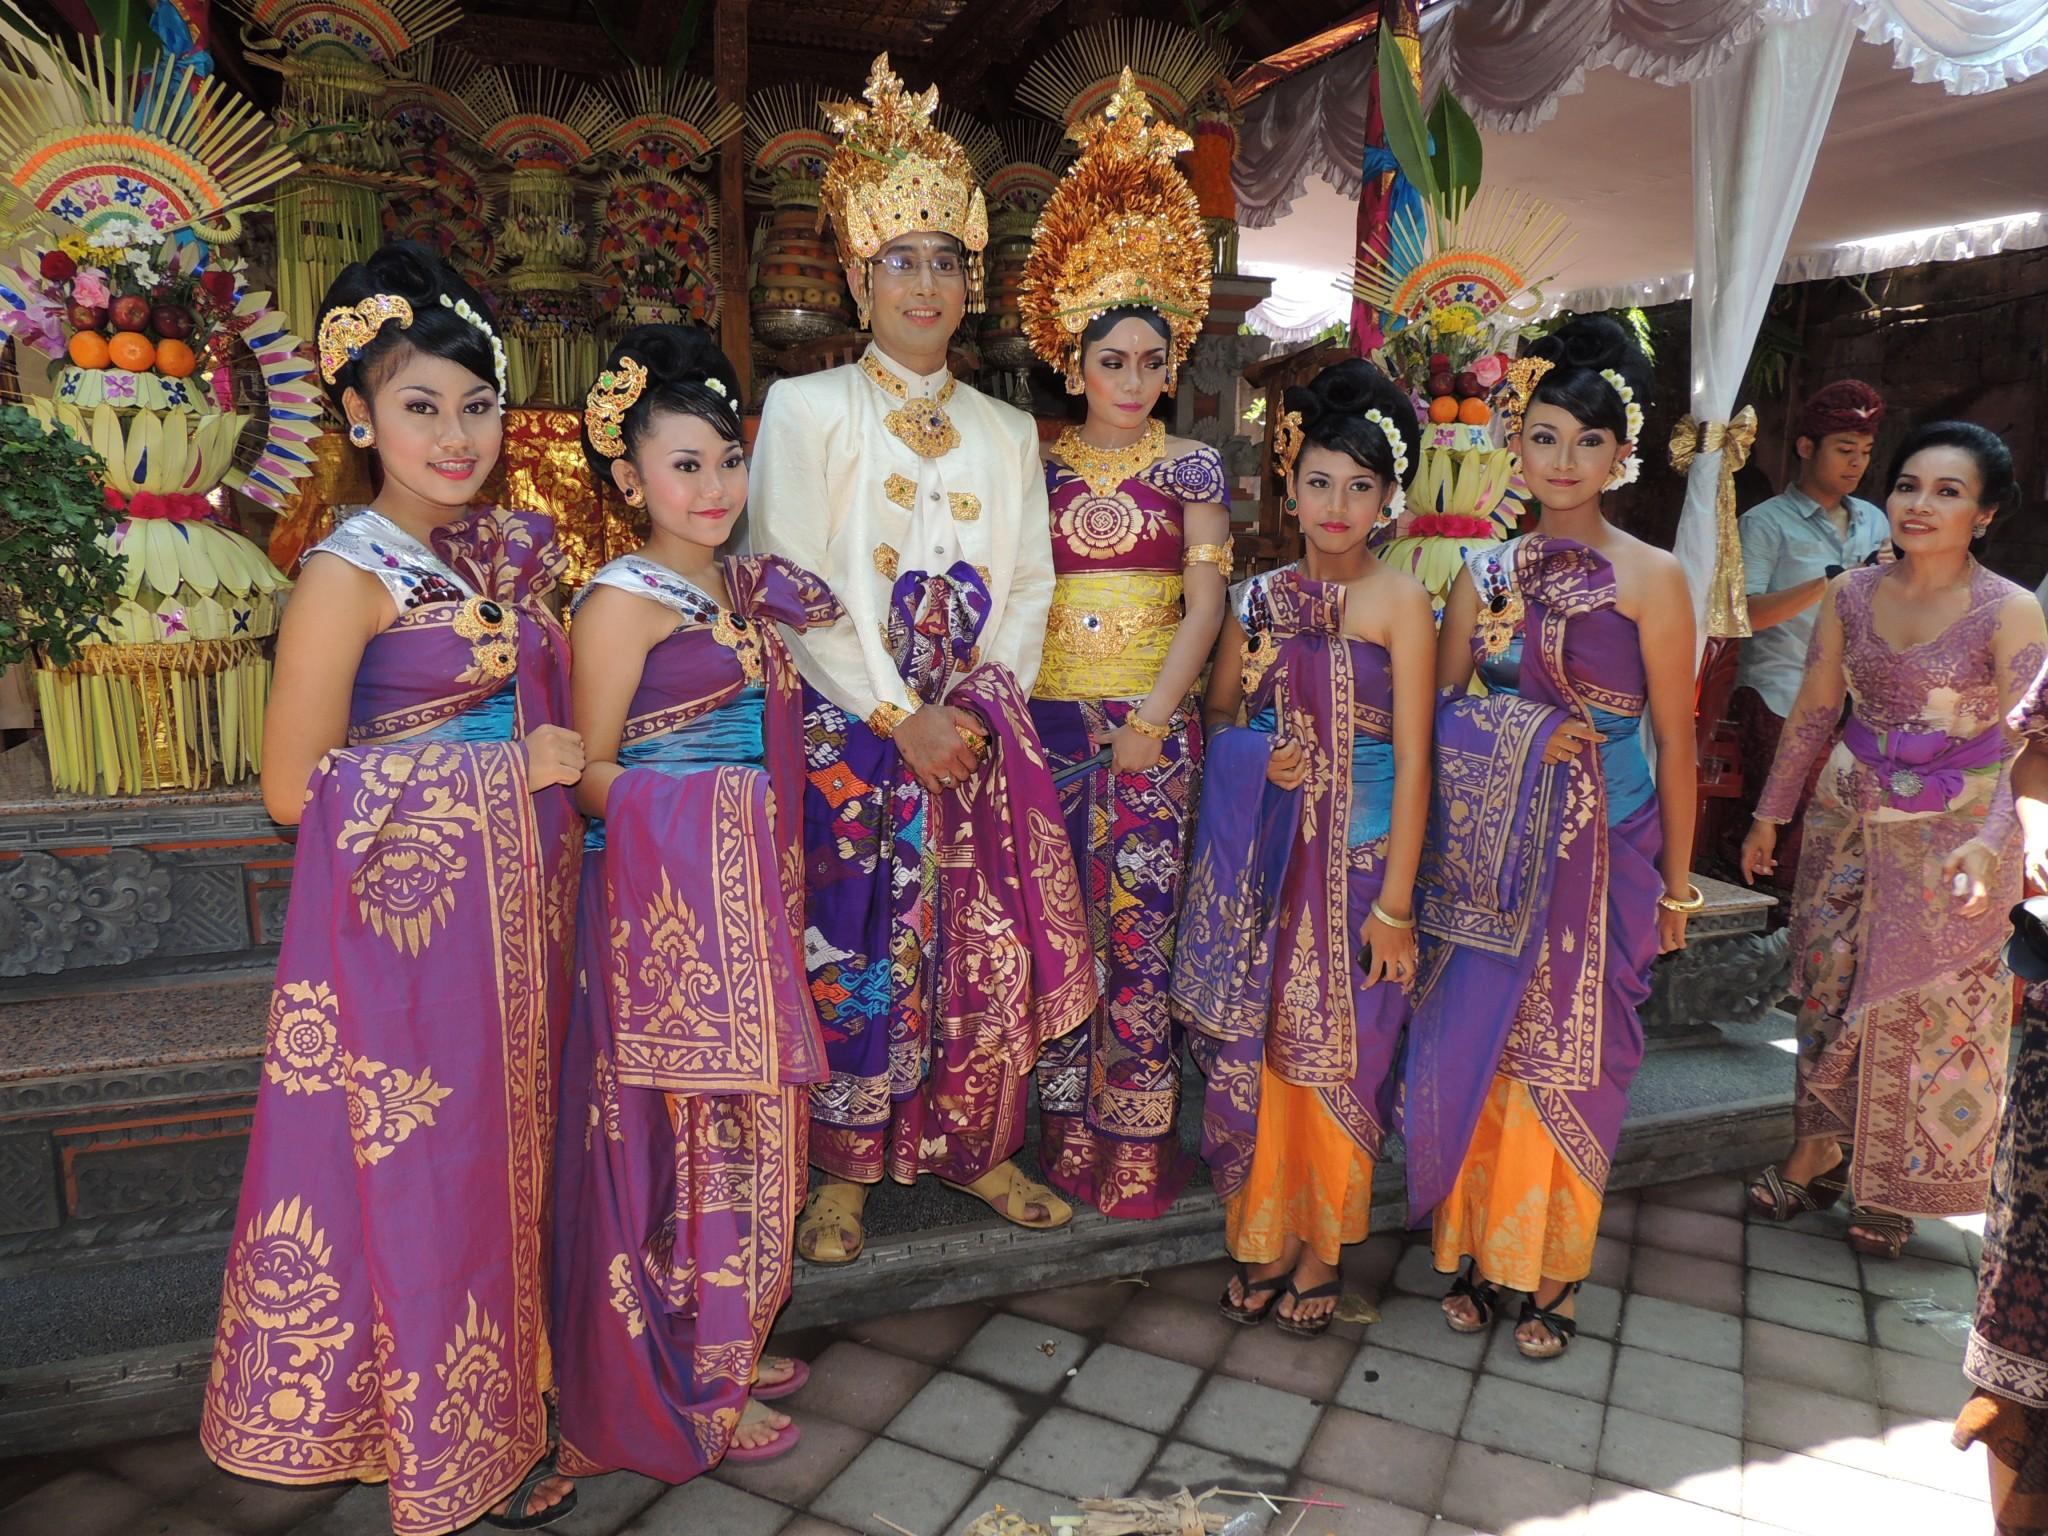 Indonesië, trouwfeest - Bali